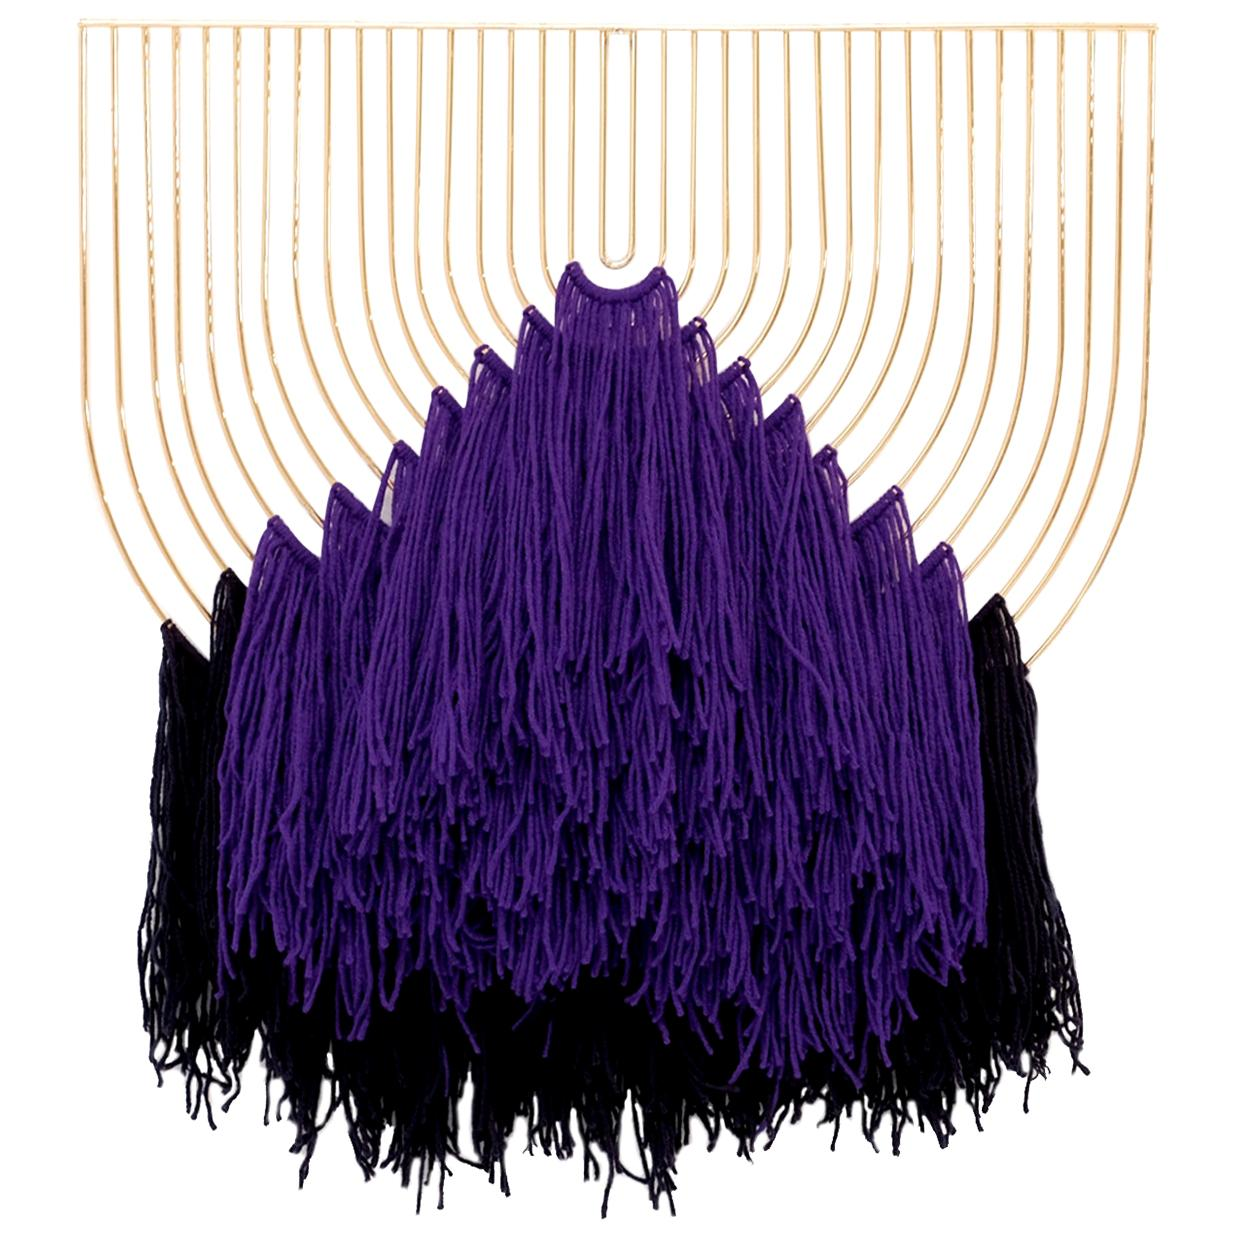 Modern Macrame Art, Wire Macrame Art Piece by Bend Goods, Purple Navy